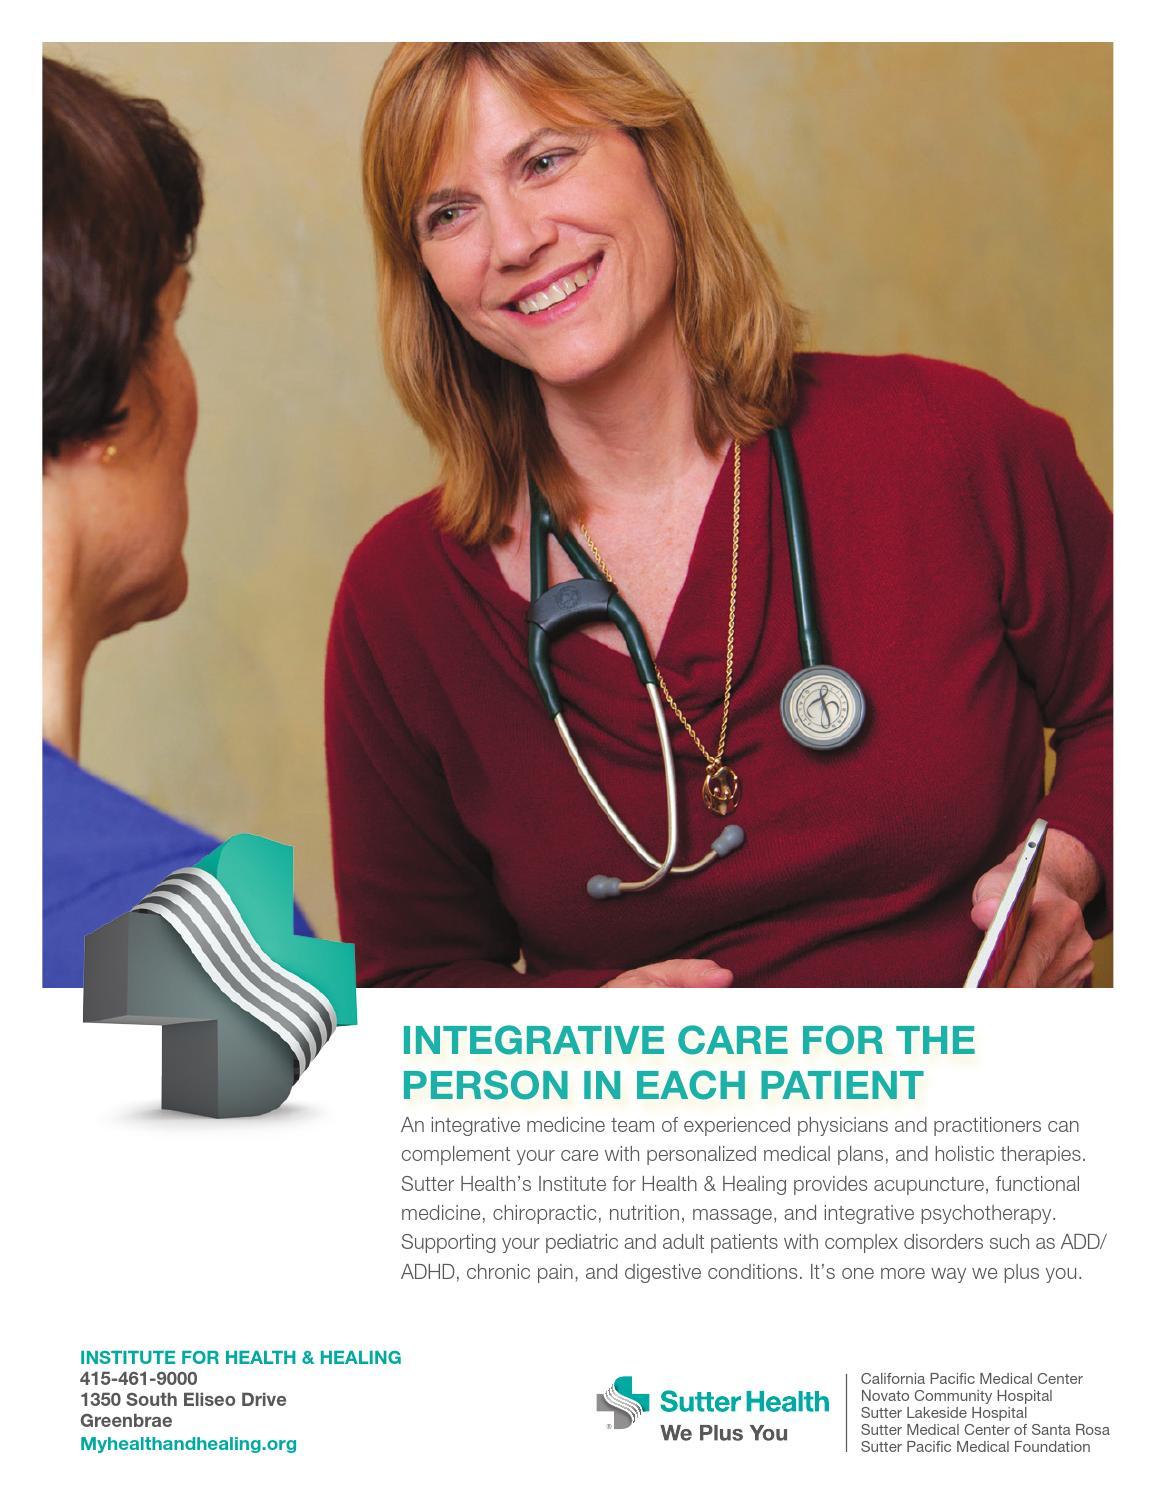 Marin Medicine Winter 2014 by Sonoma County Medical